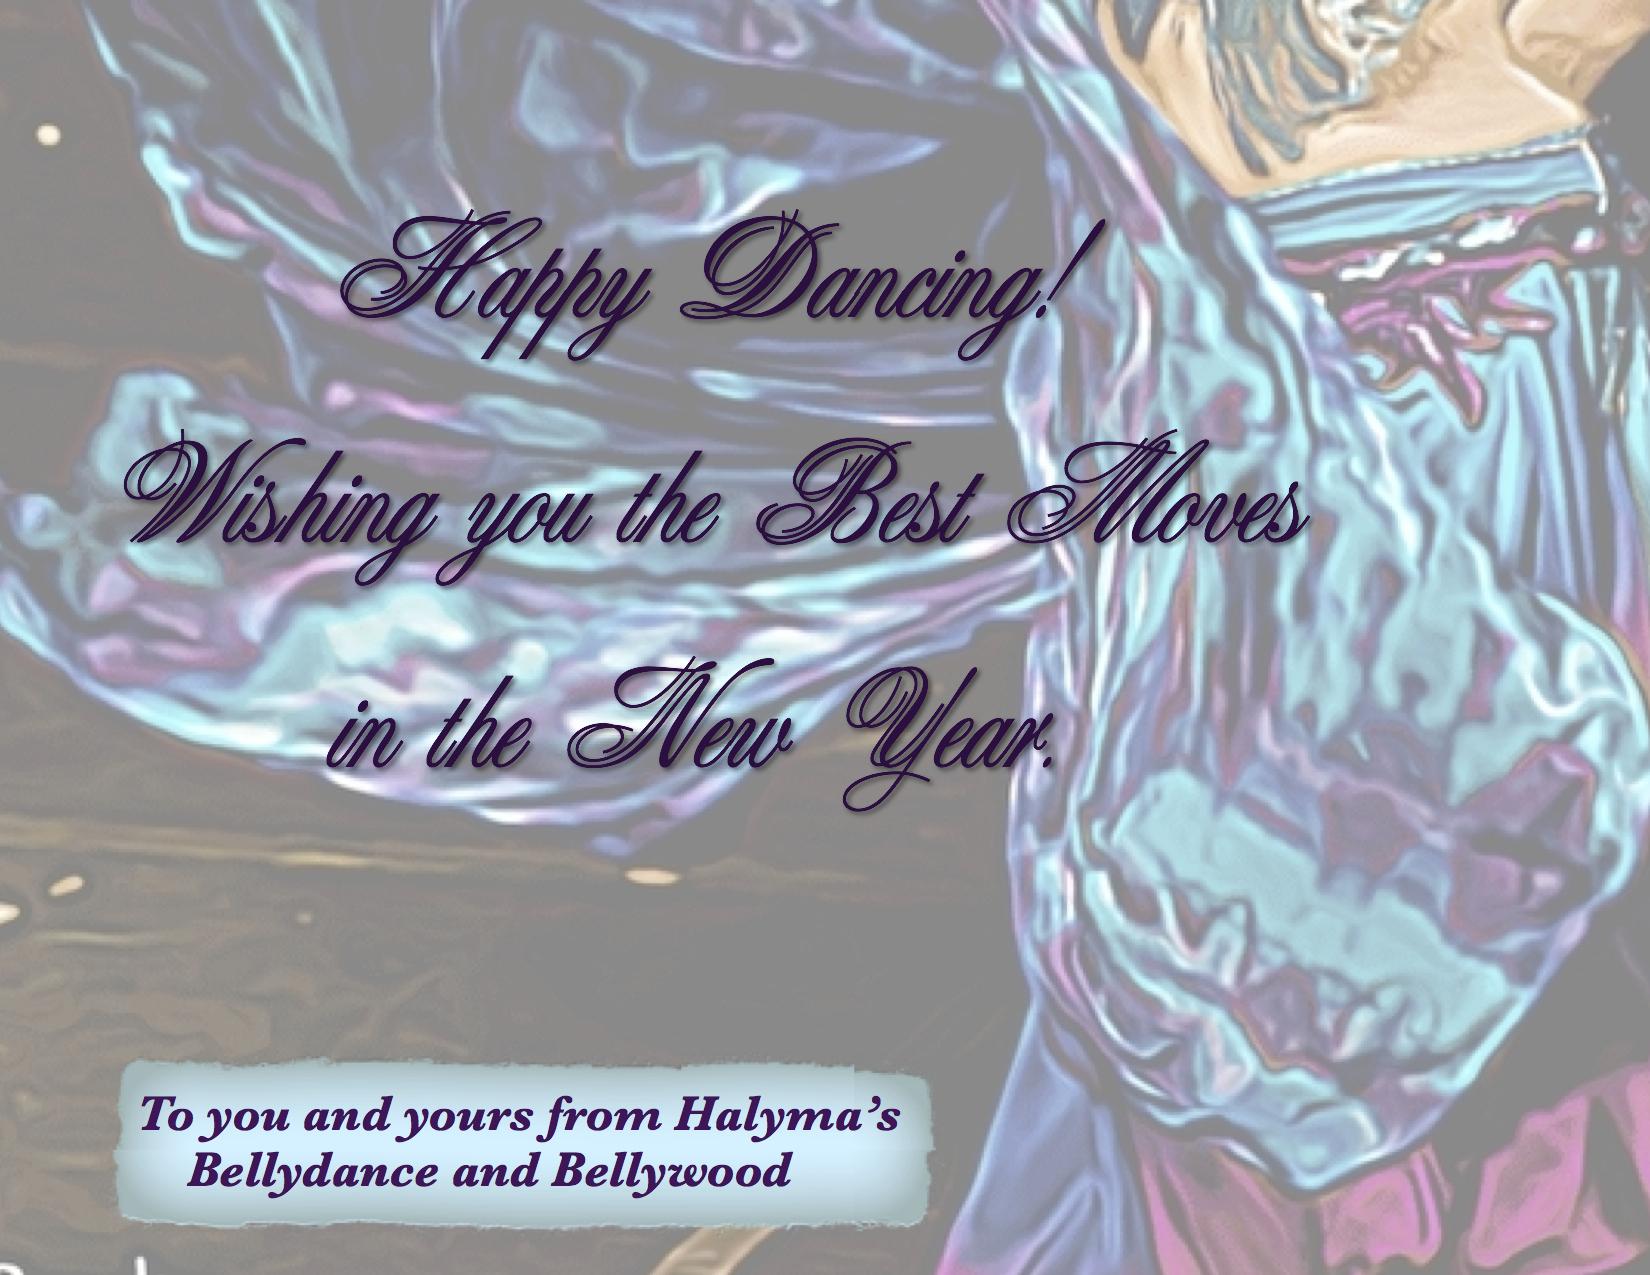 Halyma's Yule greeting 2013